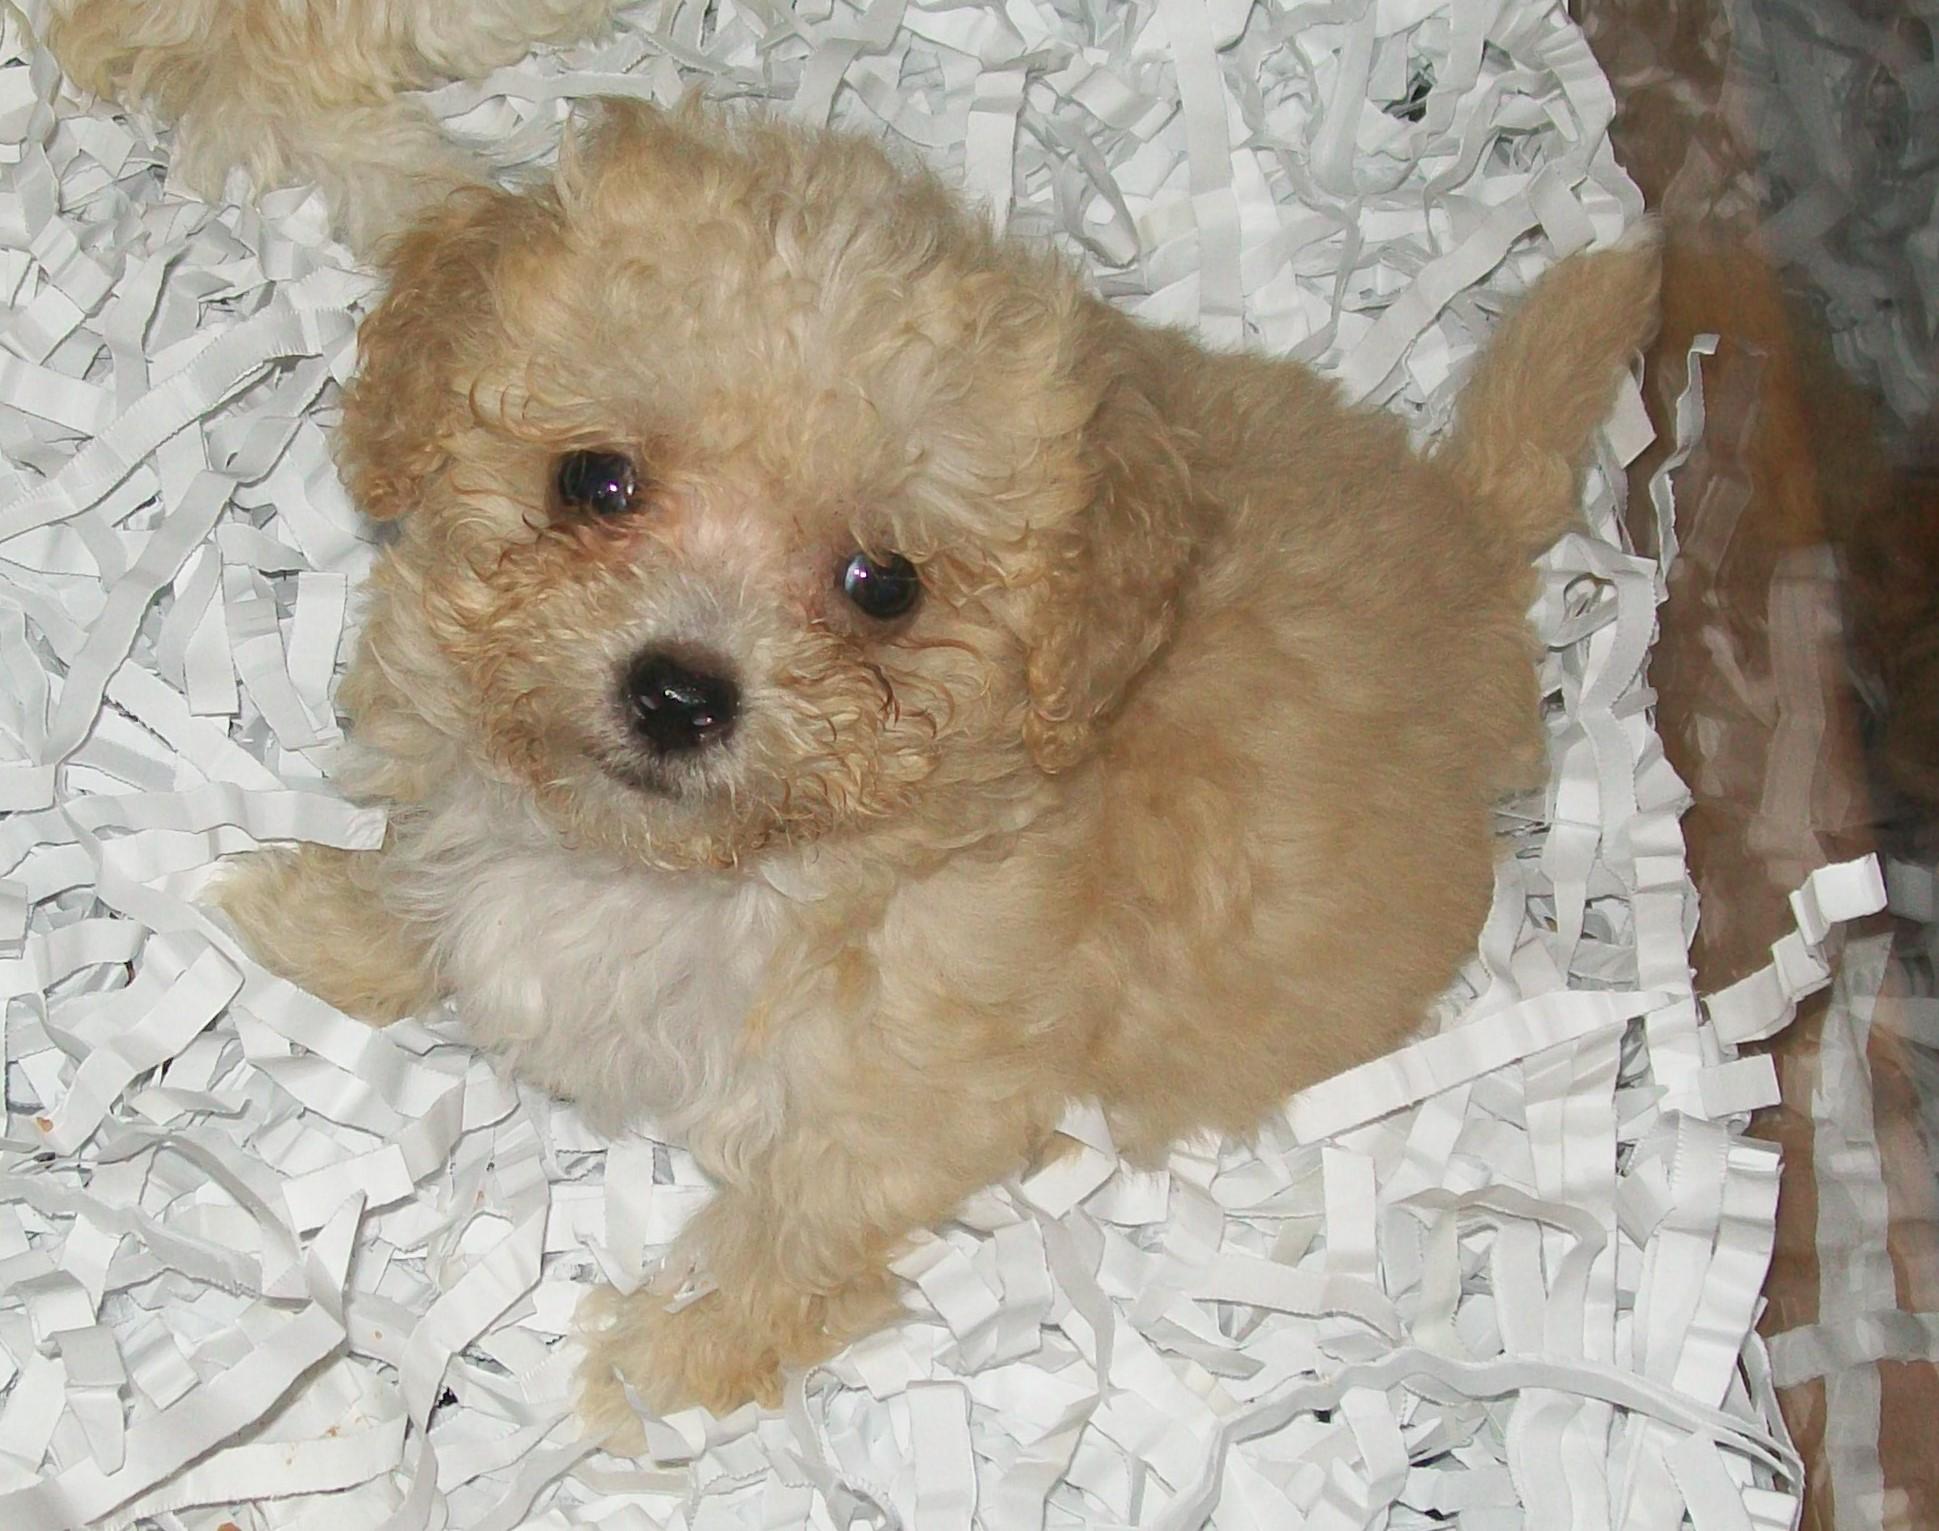 Adorable-brown-maltese-wallpaper - Dog Breeders Guide  Adorable-brown-...